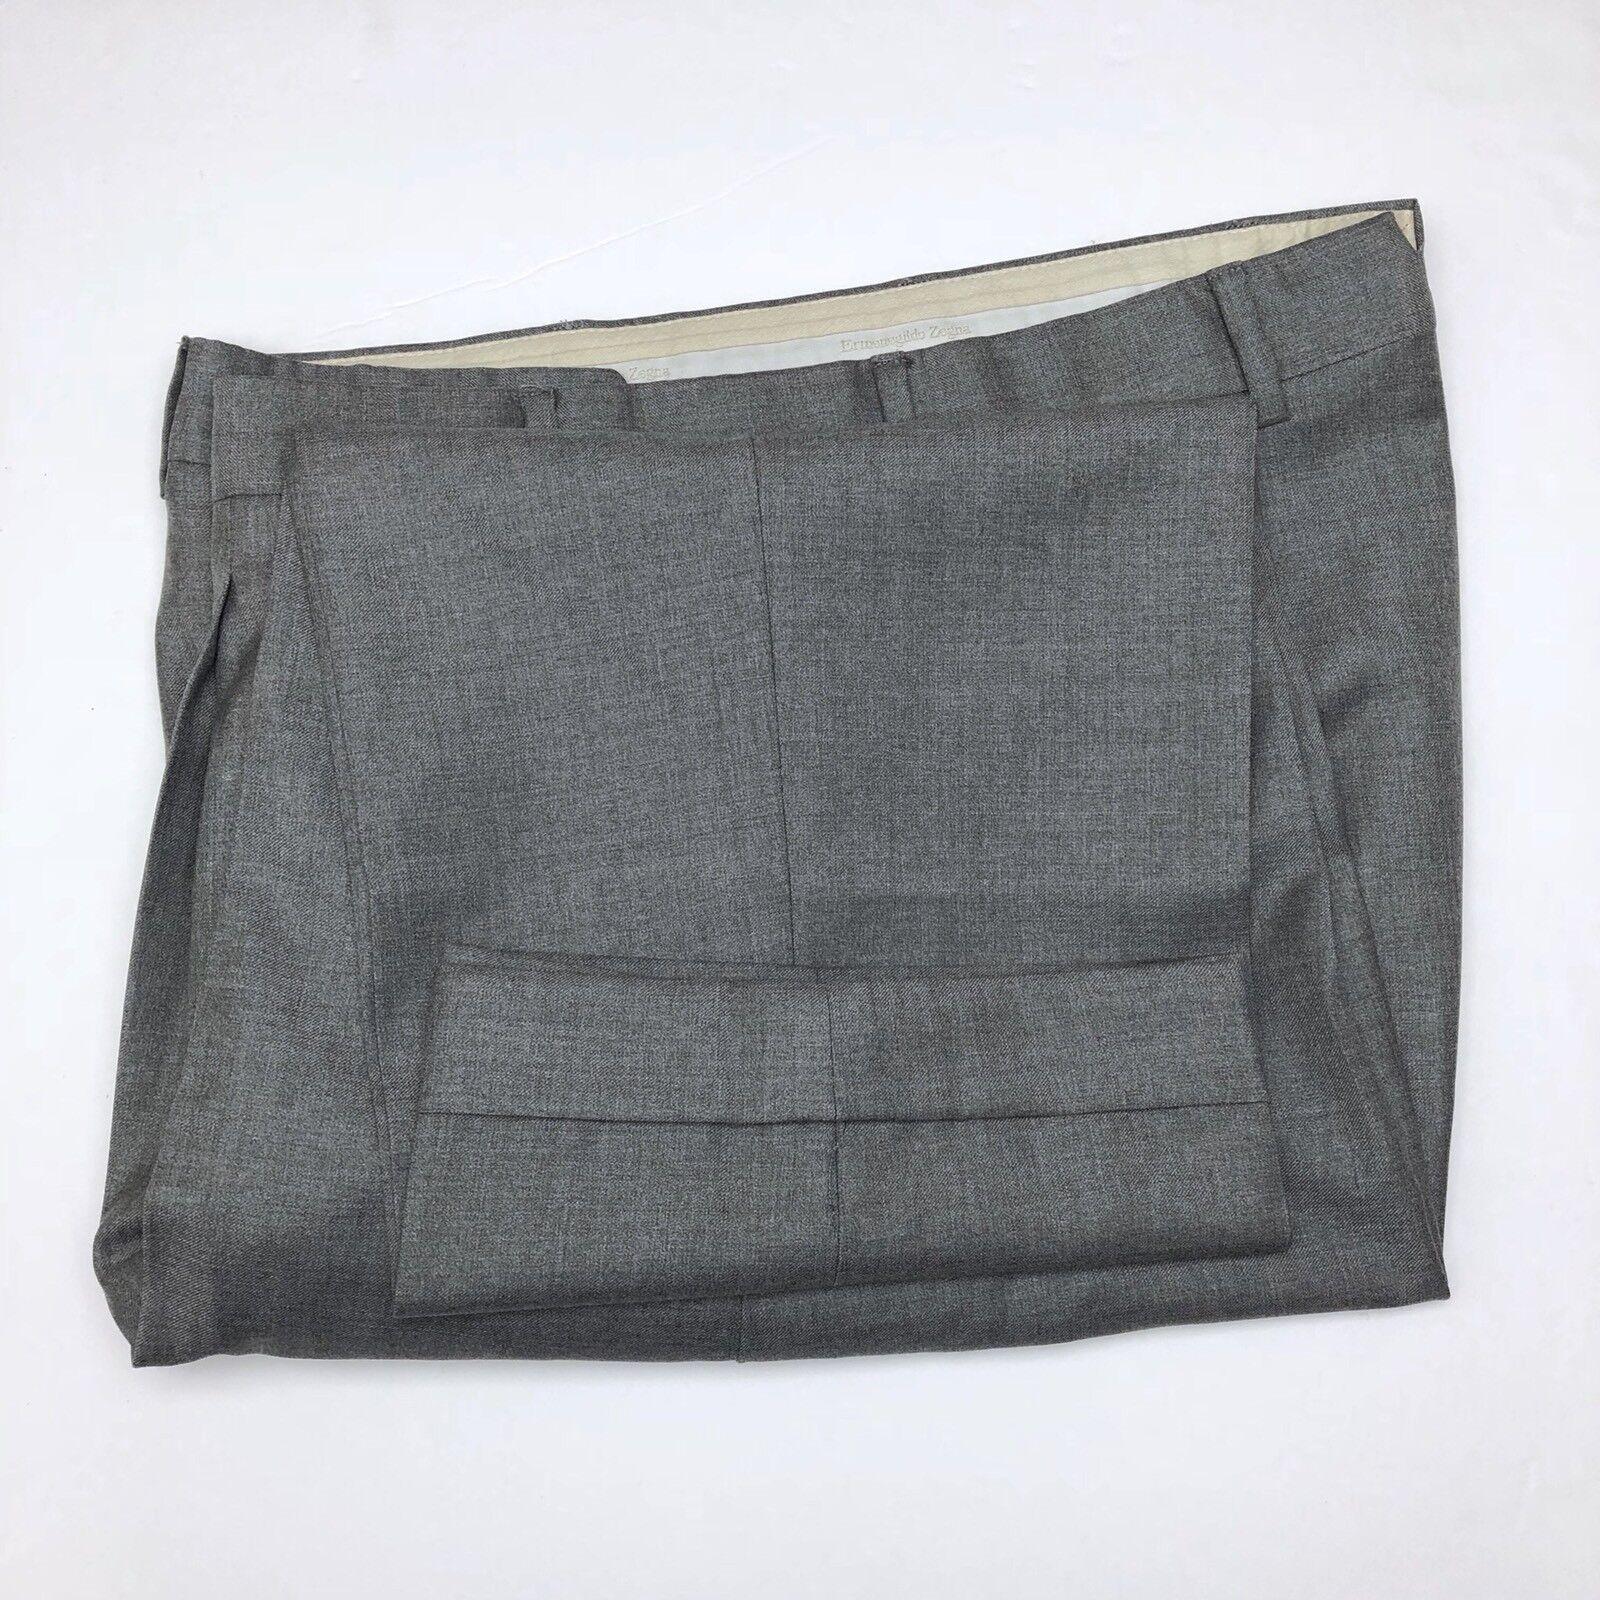 B87 Ermenegildo Zegna Pleated Wool Dress Pants Mens Size 34X24